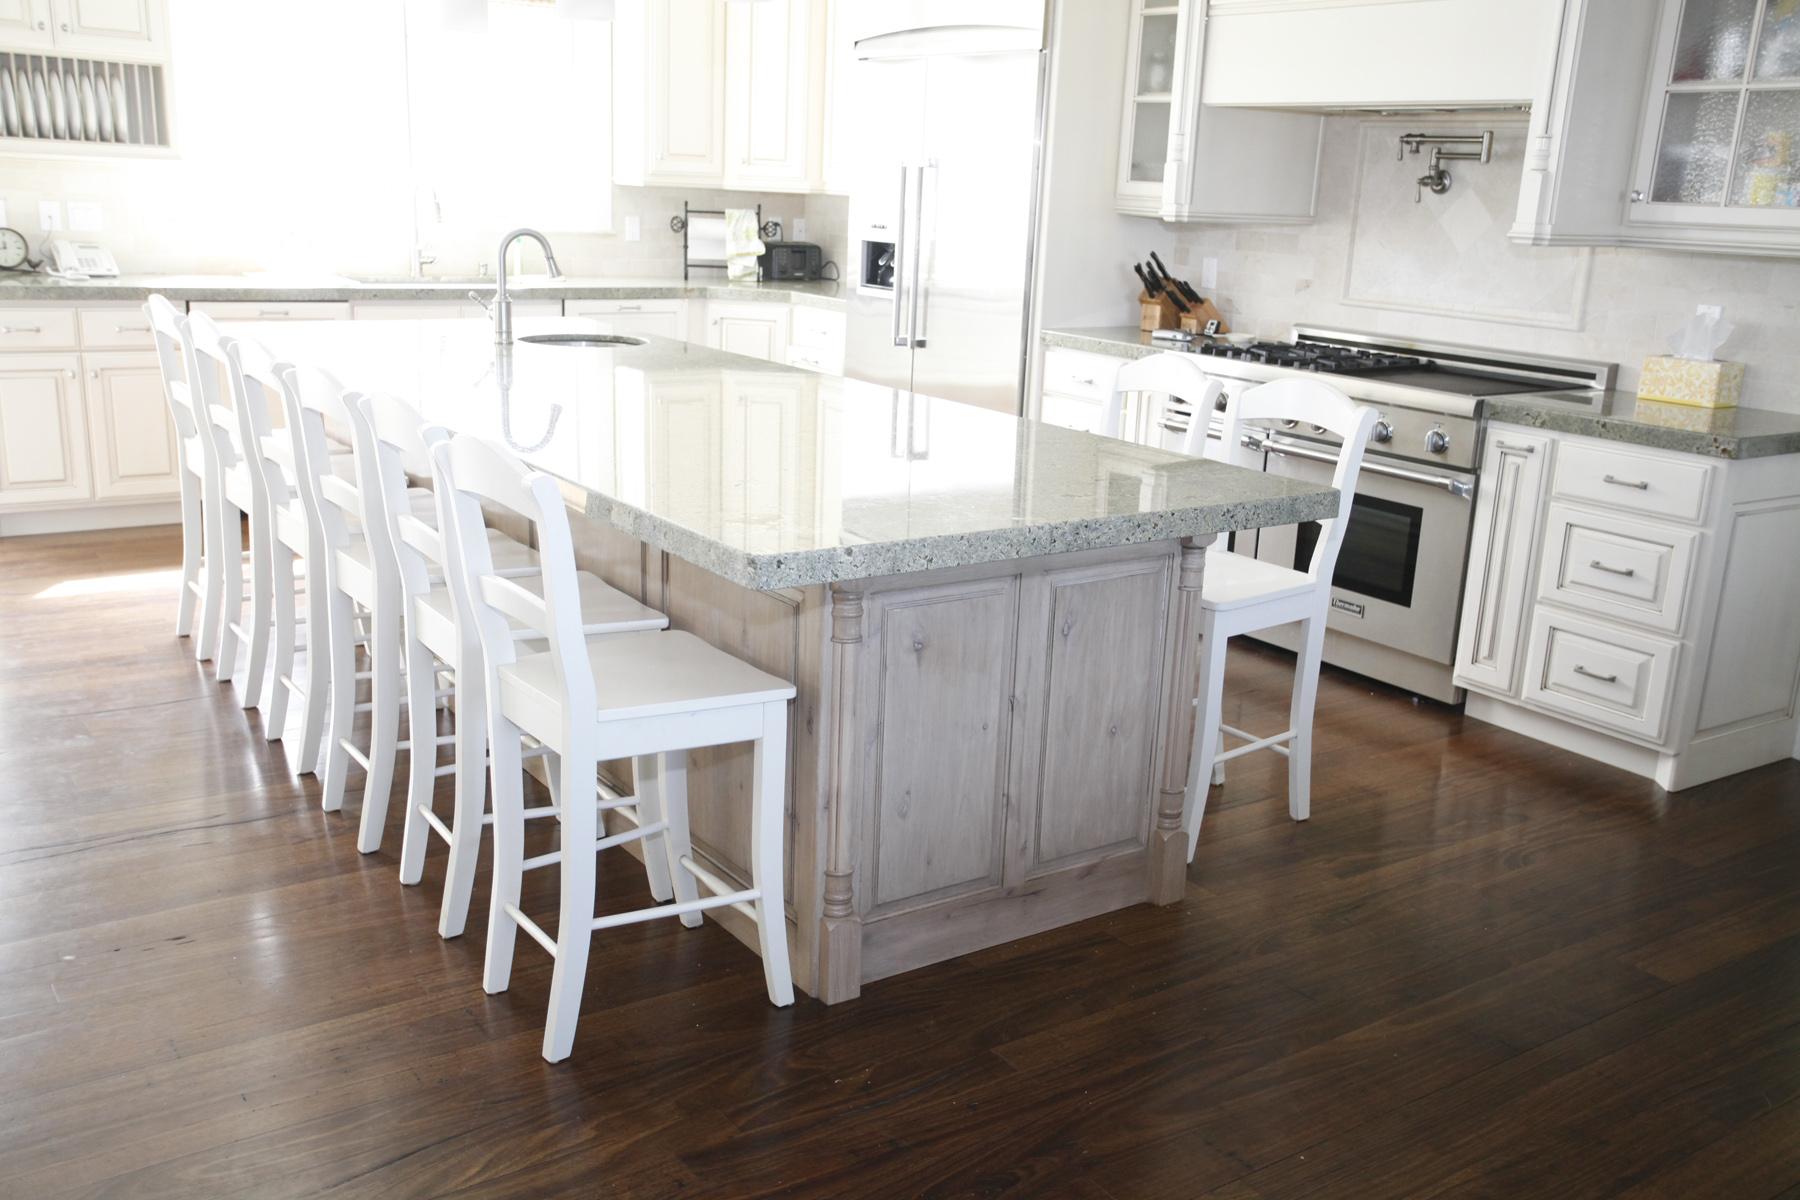 hardwood floor kitchens kitchen remodel utah Hardwood floor kitchen